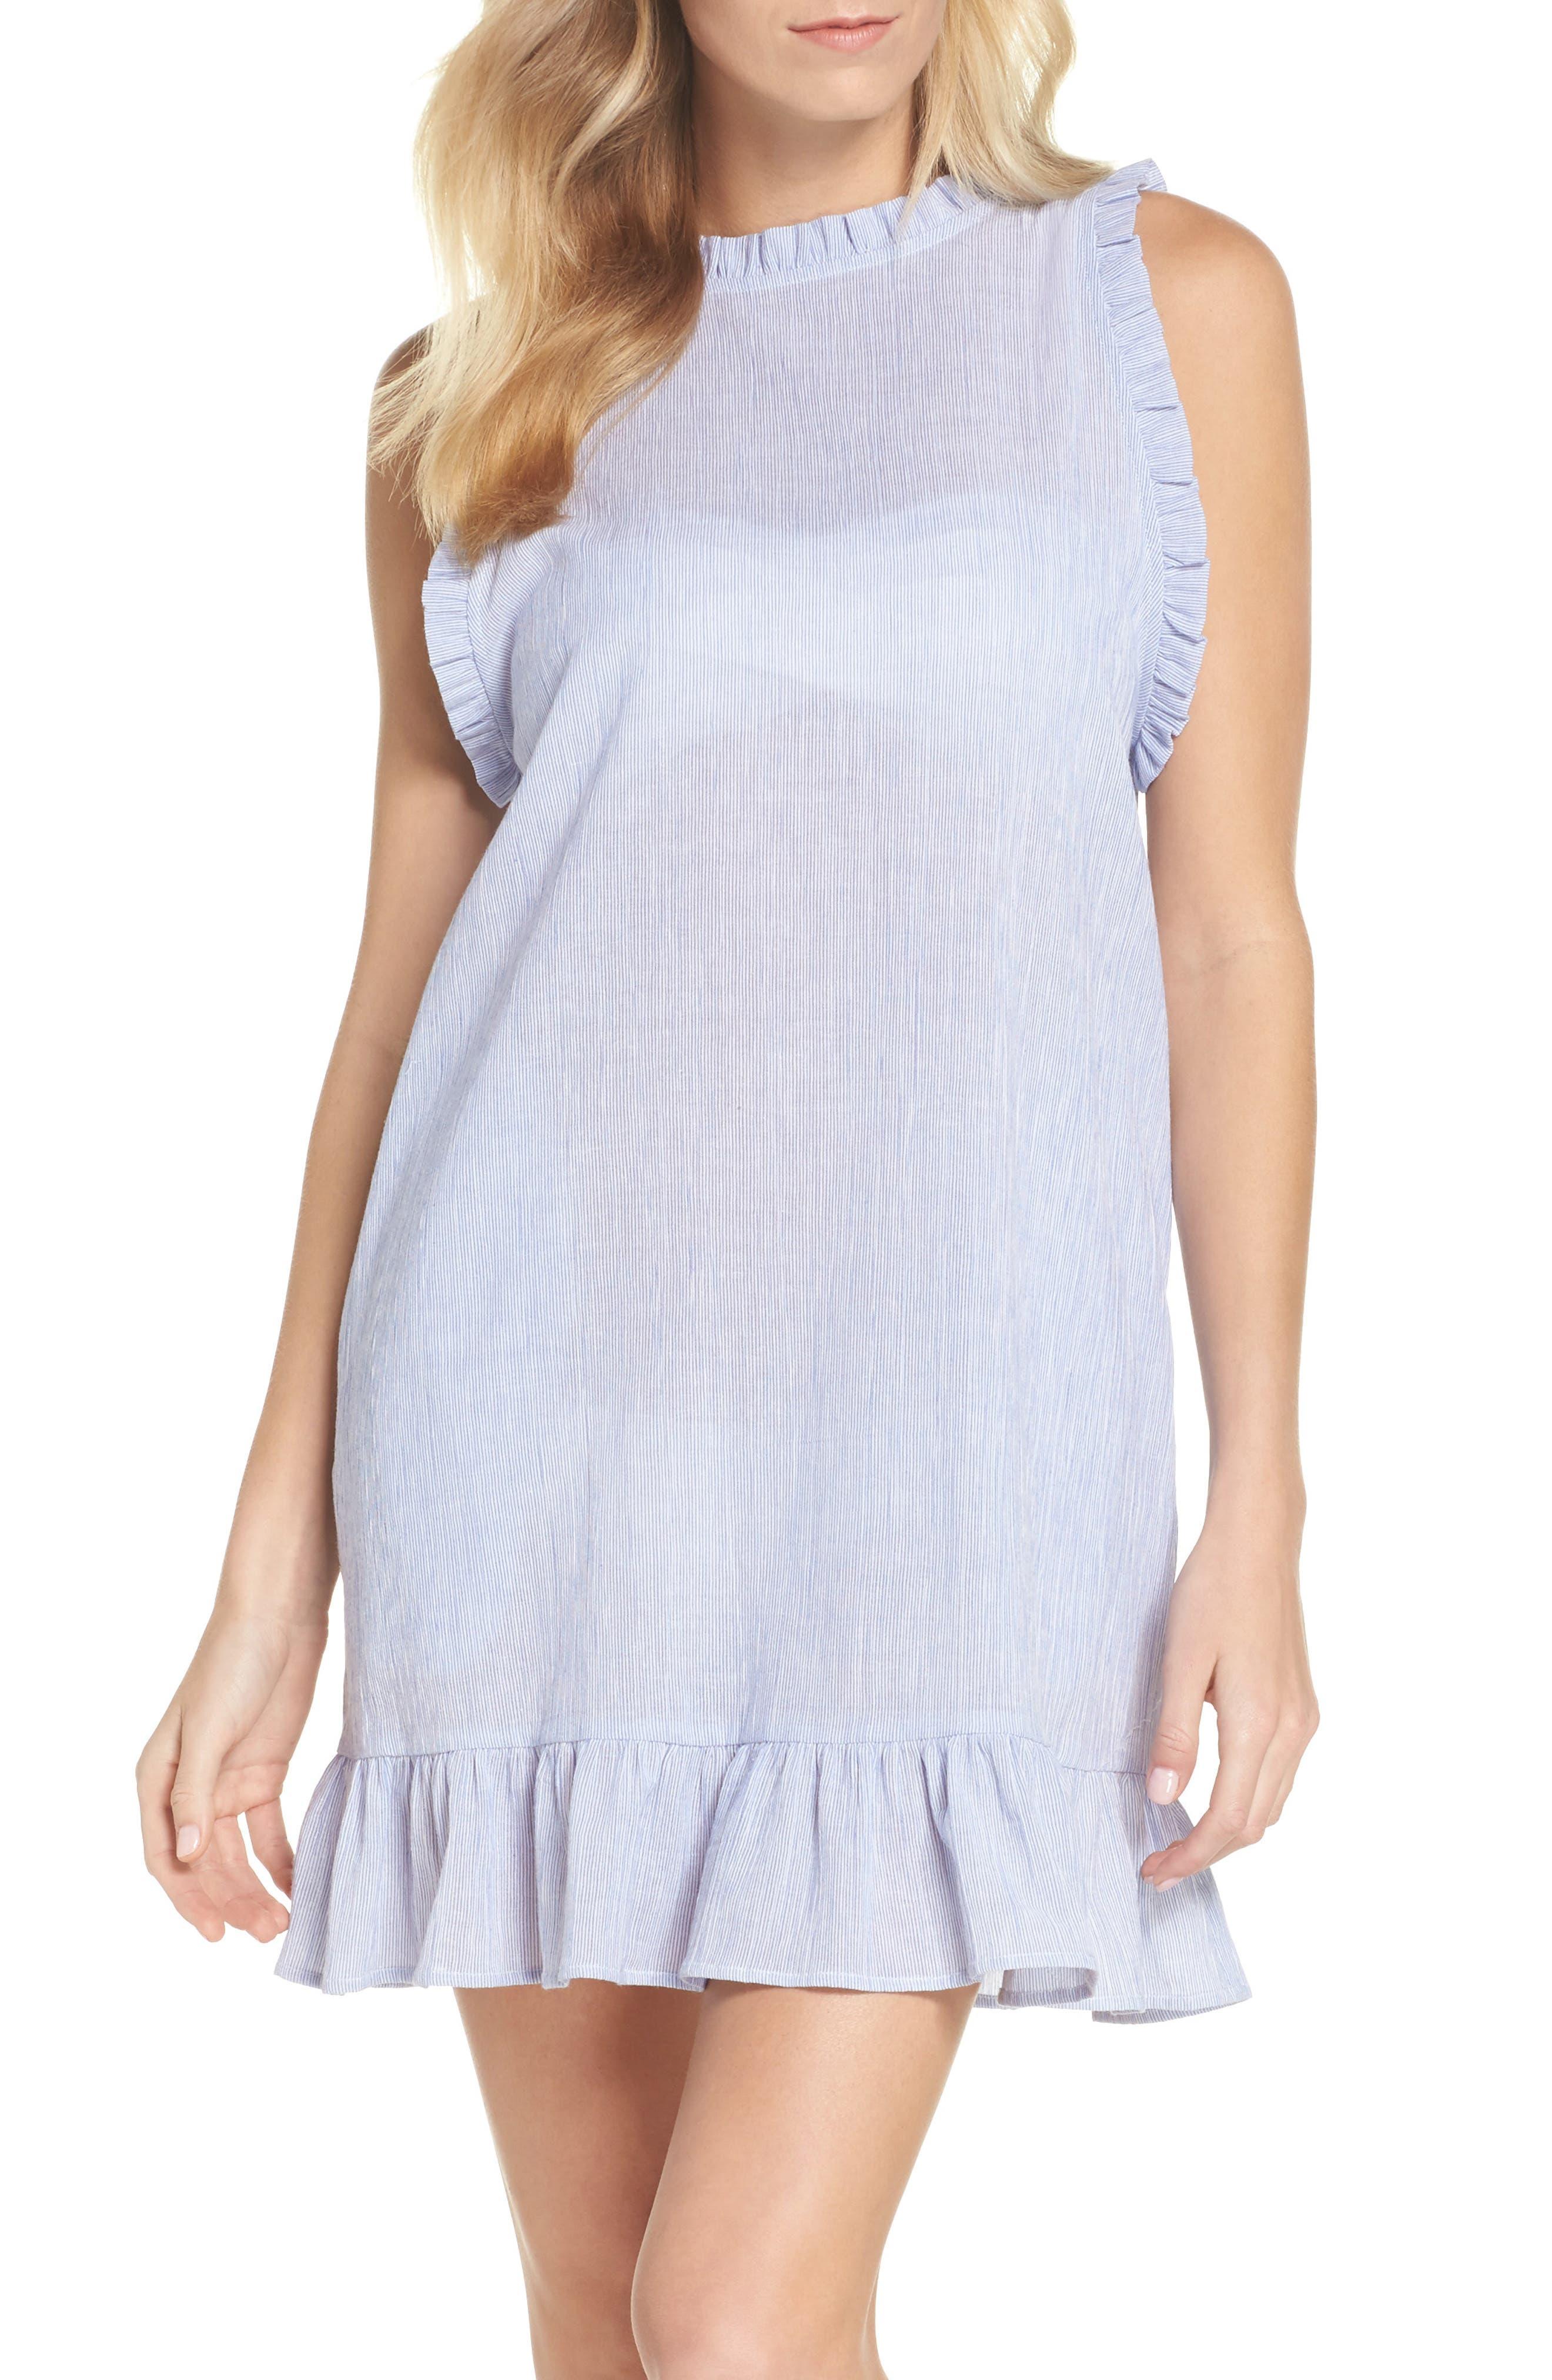 Heidi Cover-Up Dress,                             Main thumbnail 1, color,                             Blue/ White